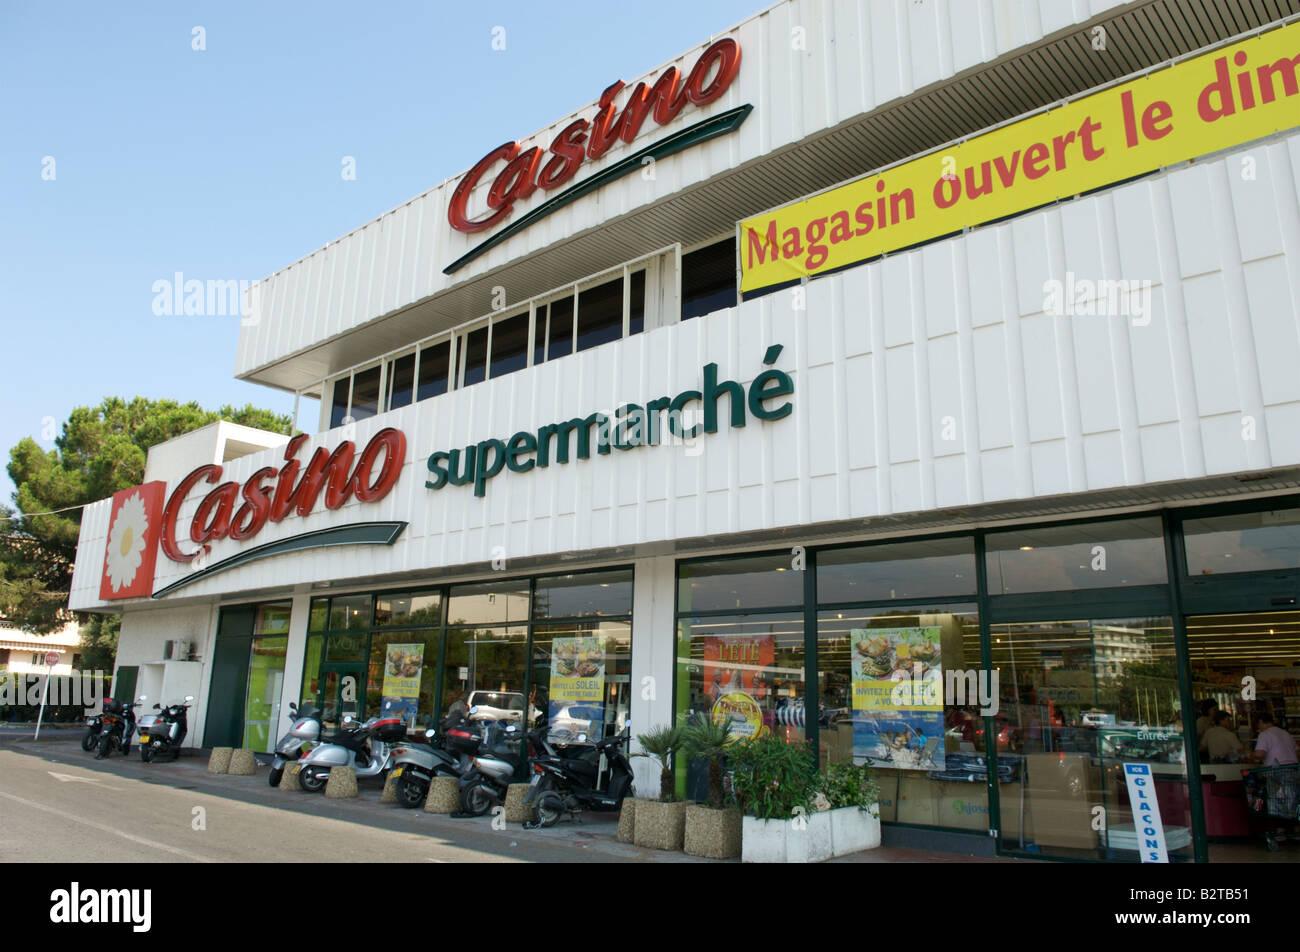 Casino supermarket france online casino workers union